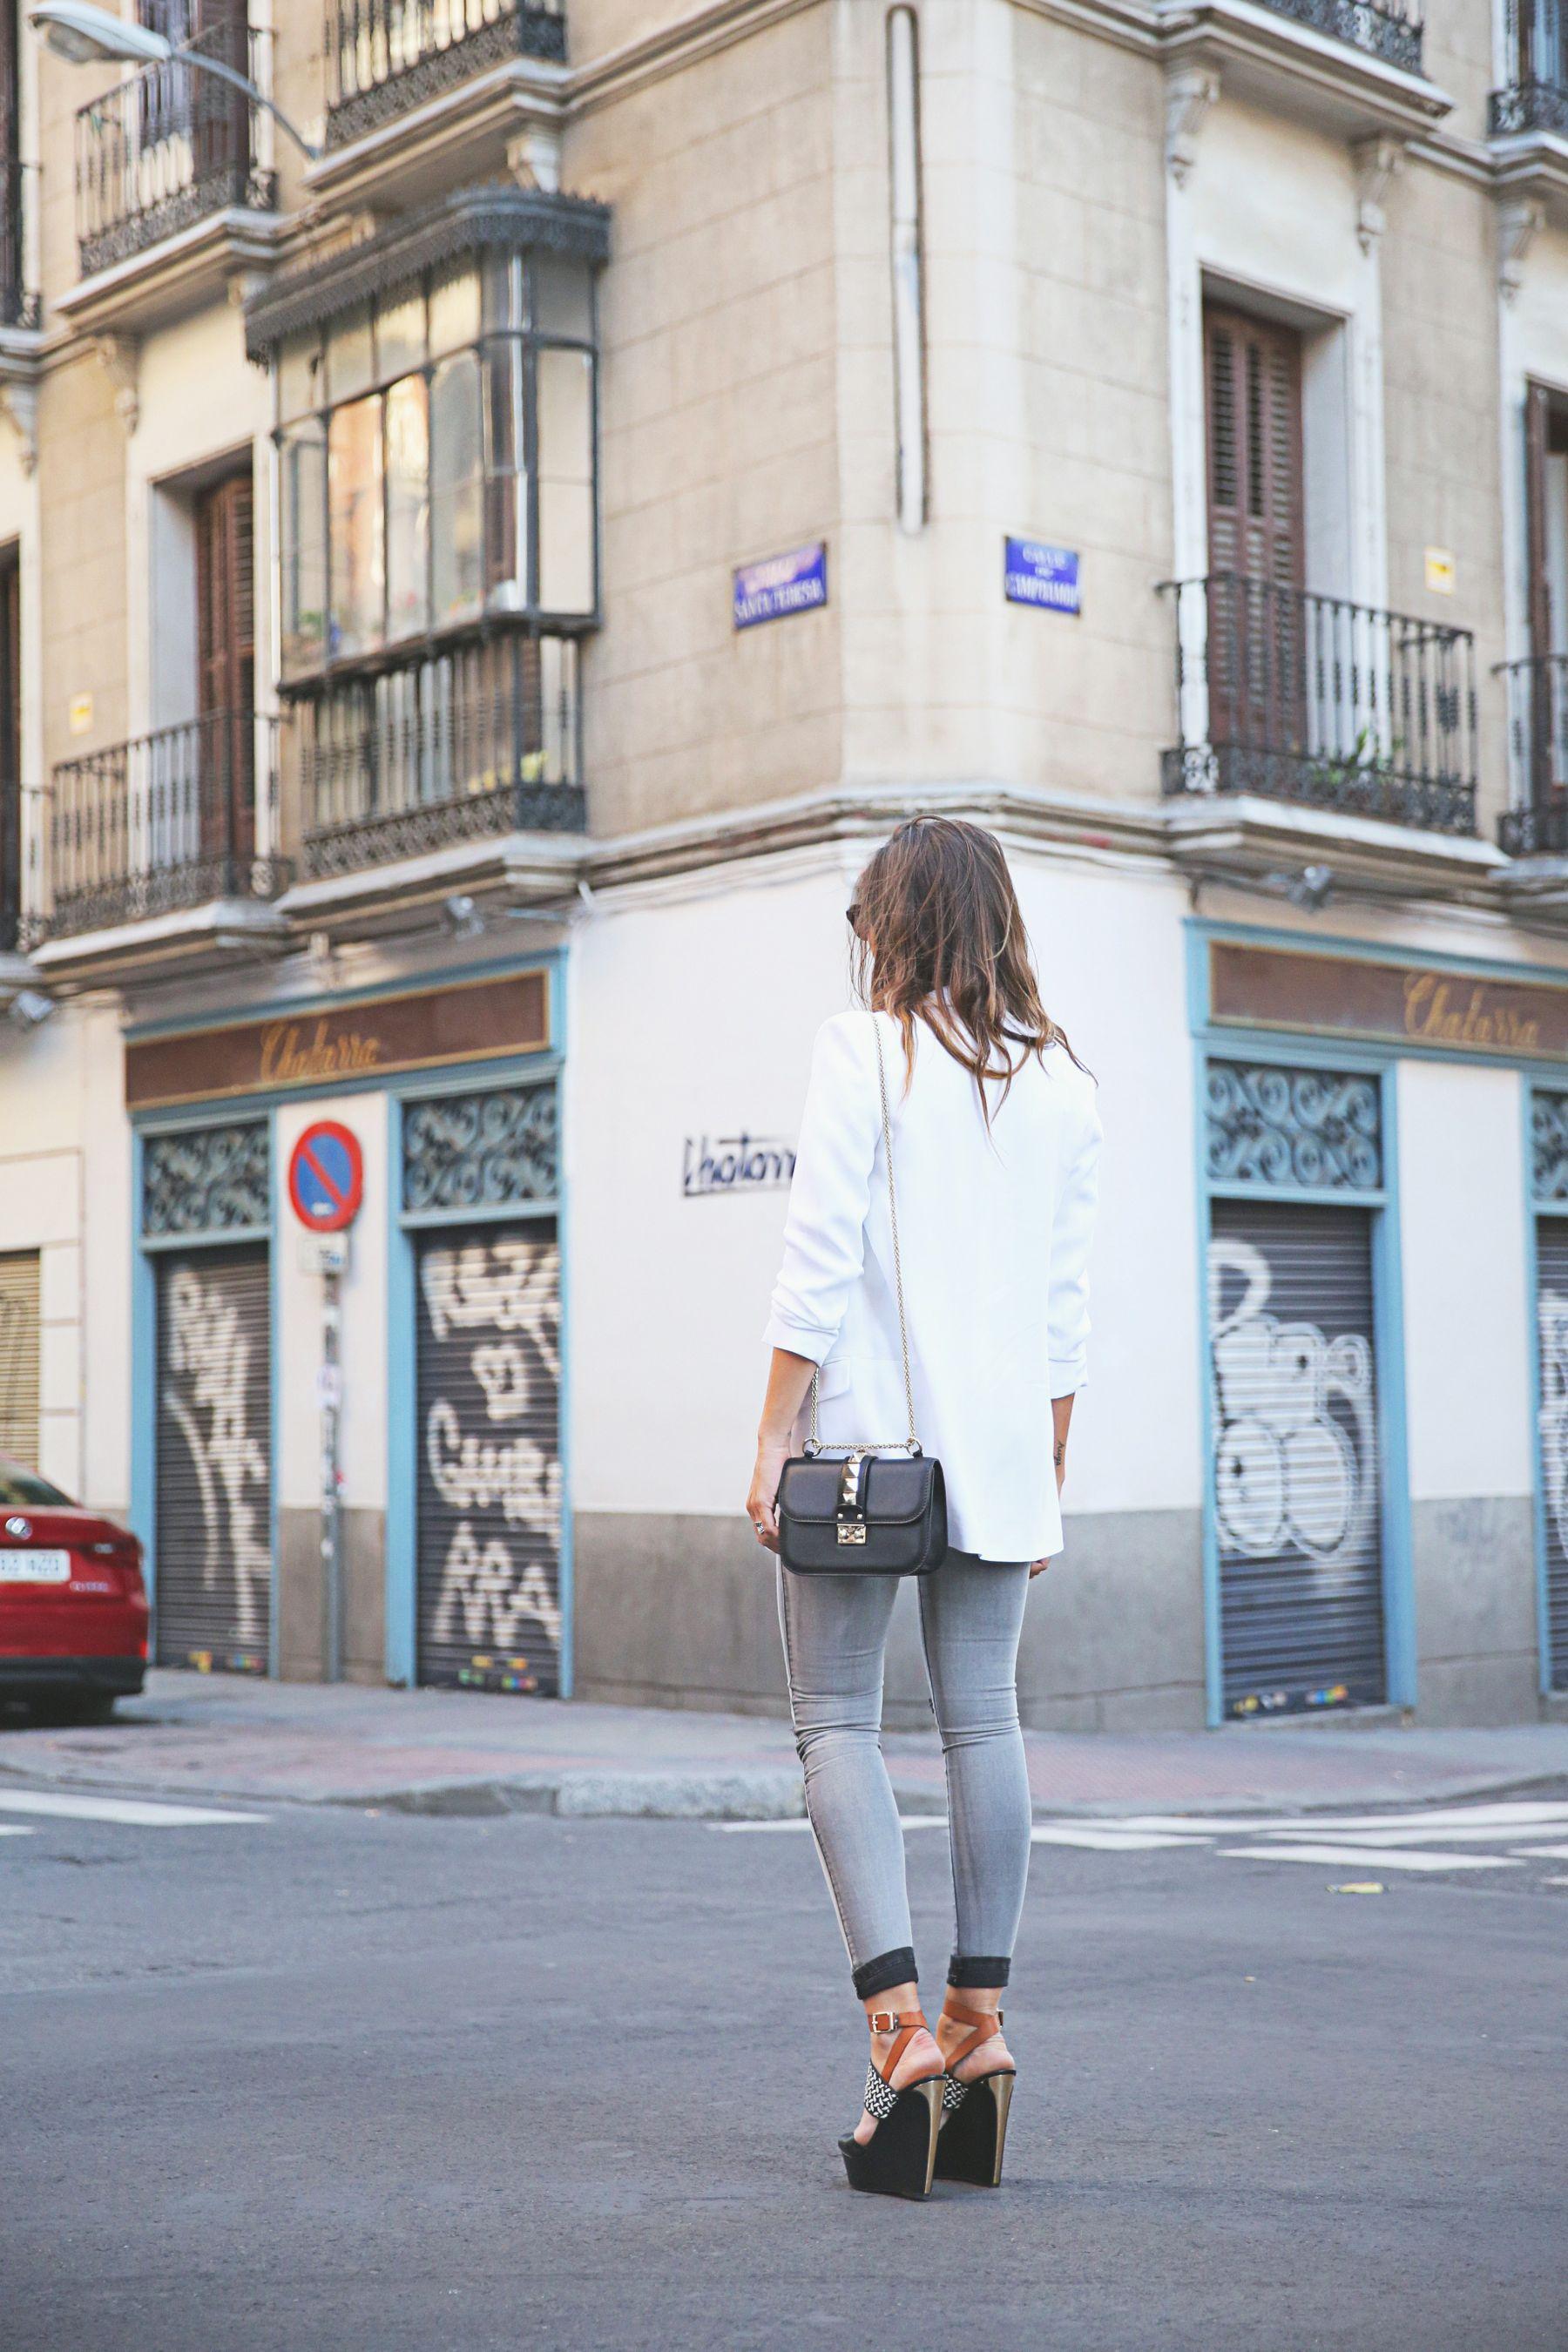 trendy-taste-look-outfit-street-style-ootd-blog-blogger-fashion-spain-moda-españa-SS15-verano2015-tendencias-trends-zara-buylevard-valentino-jessica-simpson-skinny-jeans-grey-white-blazer-americana-blanca-vaqueros-pitillo-sandalias-sandals-etnicas-6